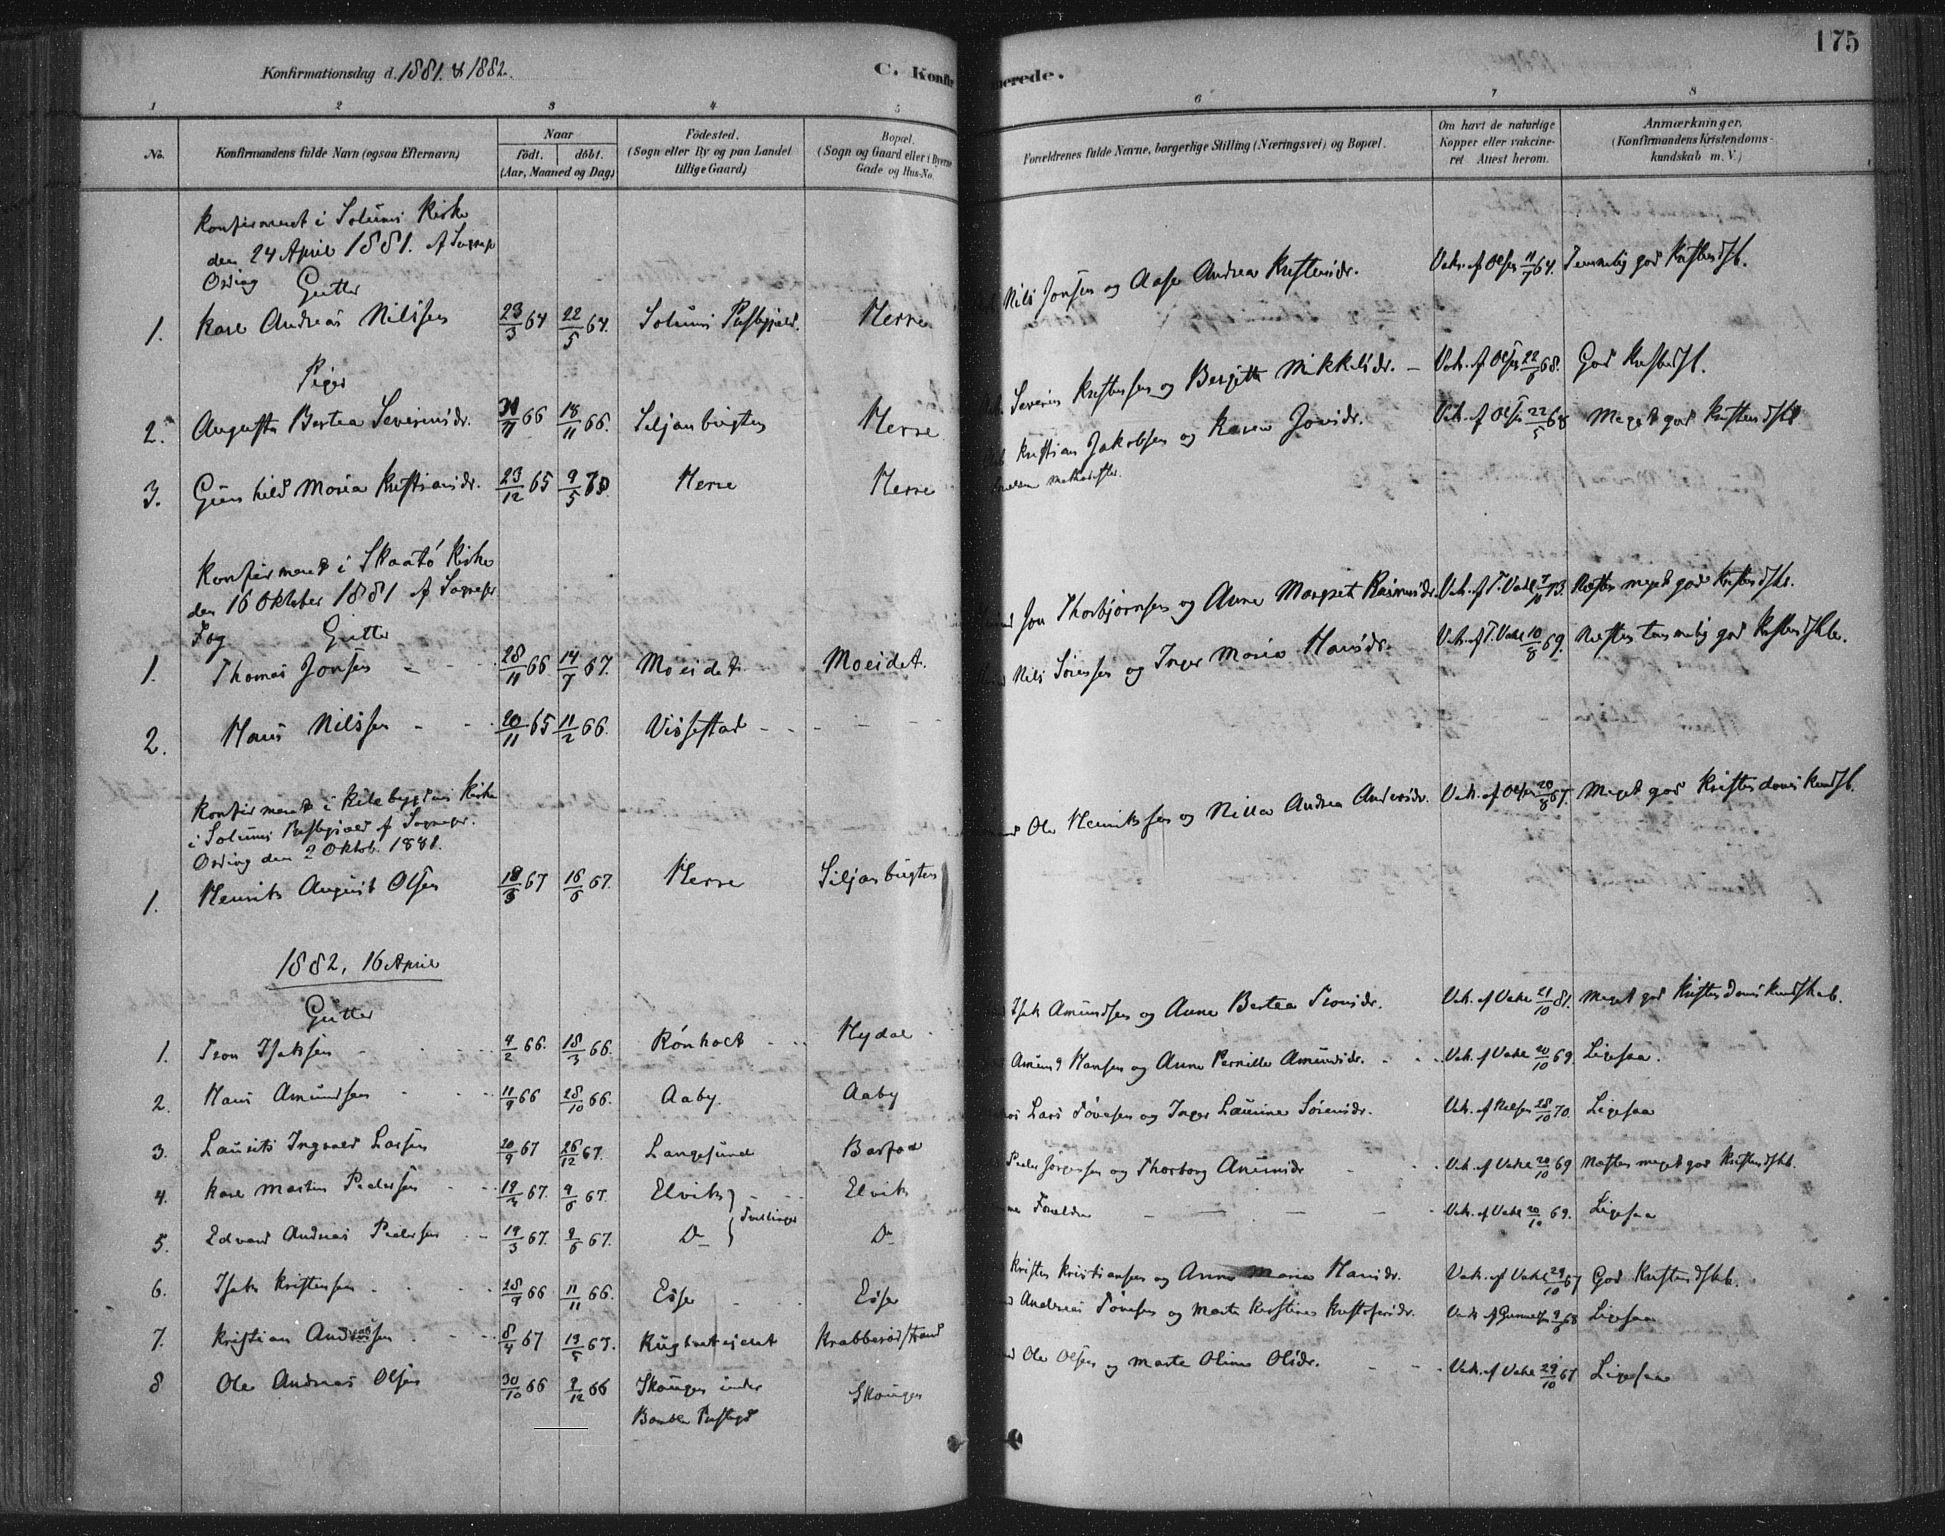 SAKO, Bamble kirkebøker, F/Fa/L0007: Ministerialbok nr. I 7, 1878-1888, s. 175